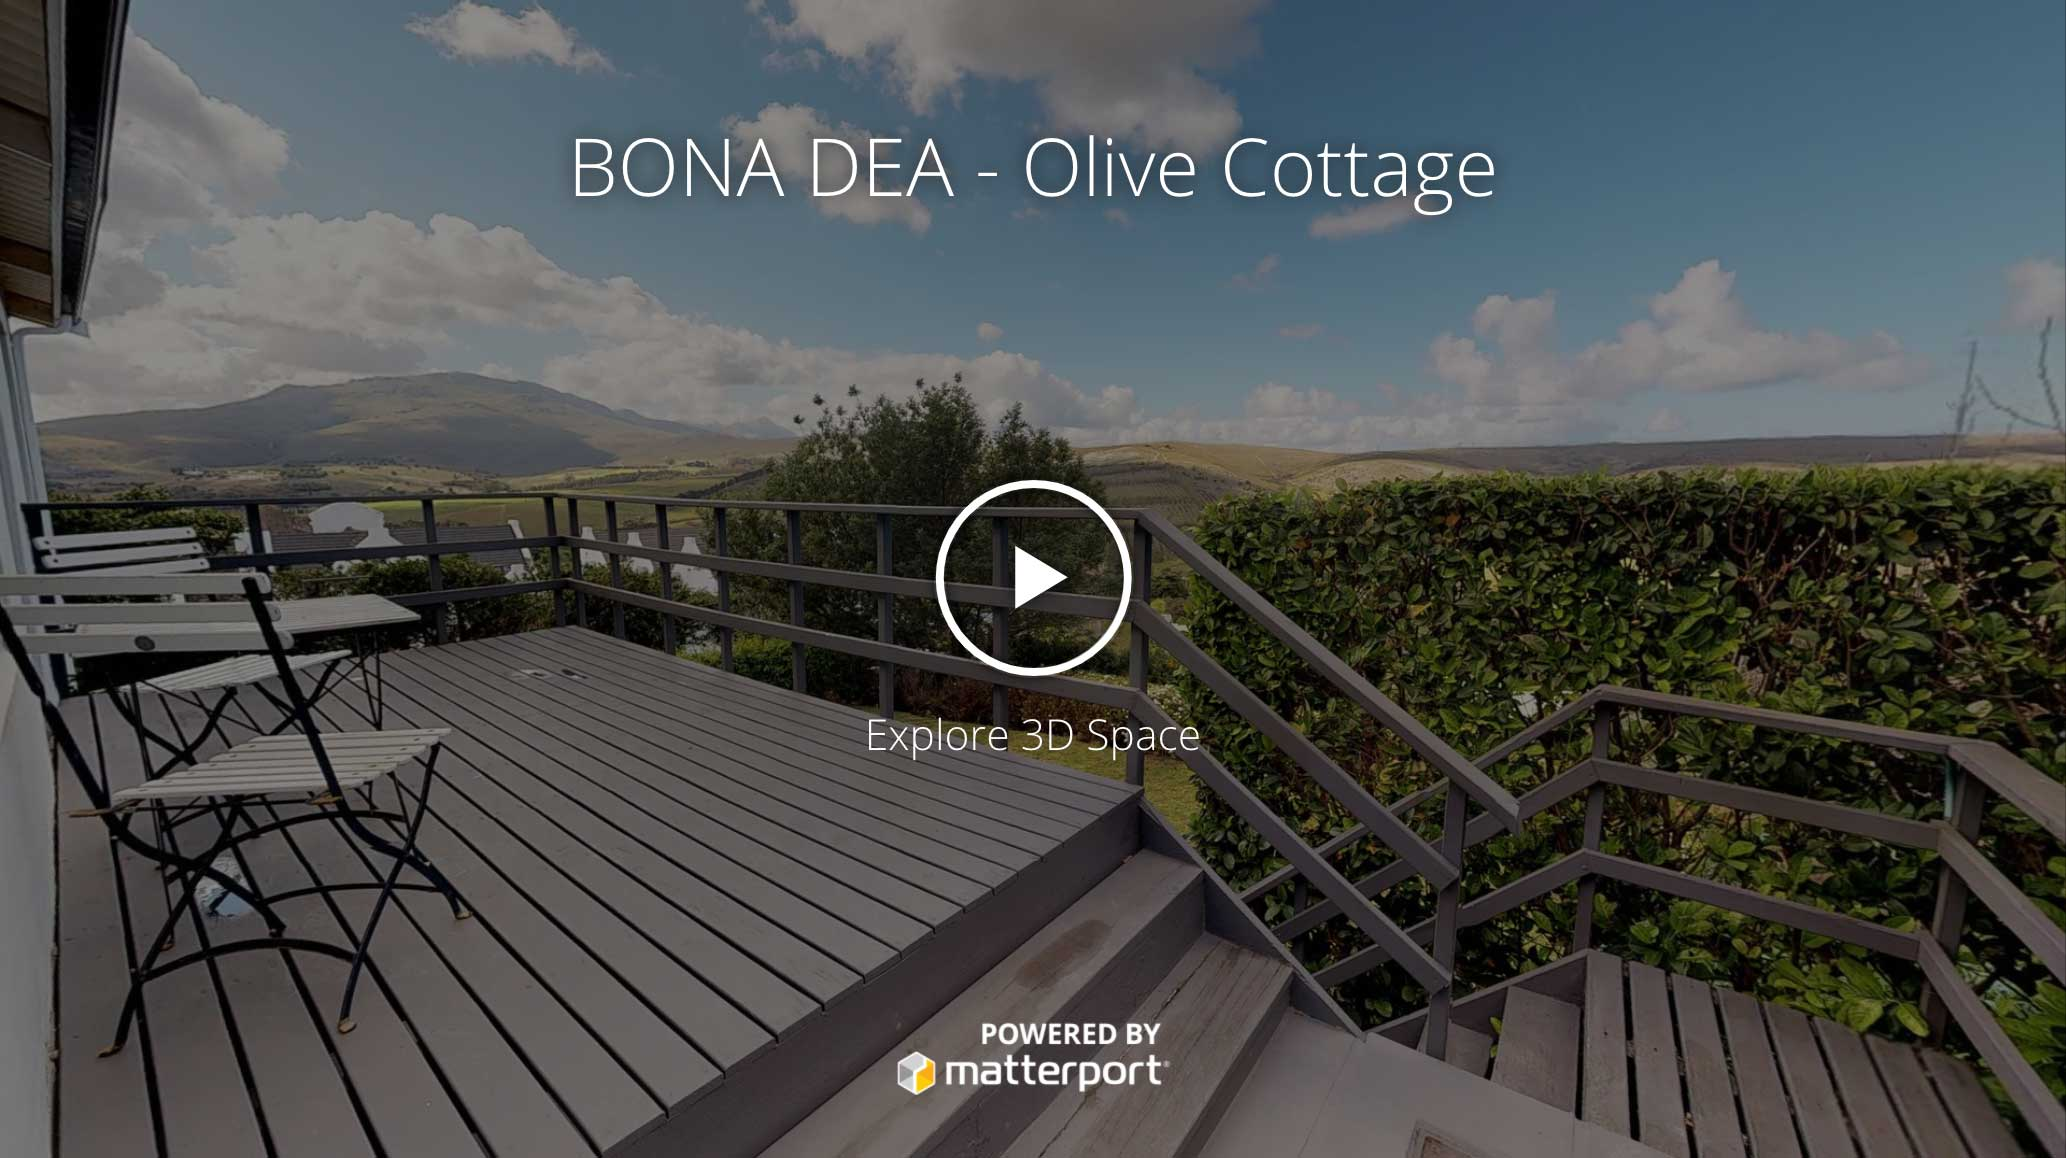 Hotels, Lodges, Resorts and B&Bs